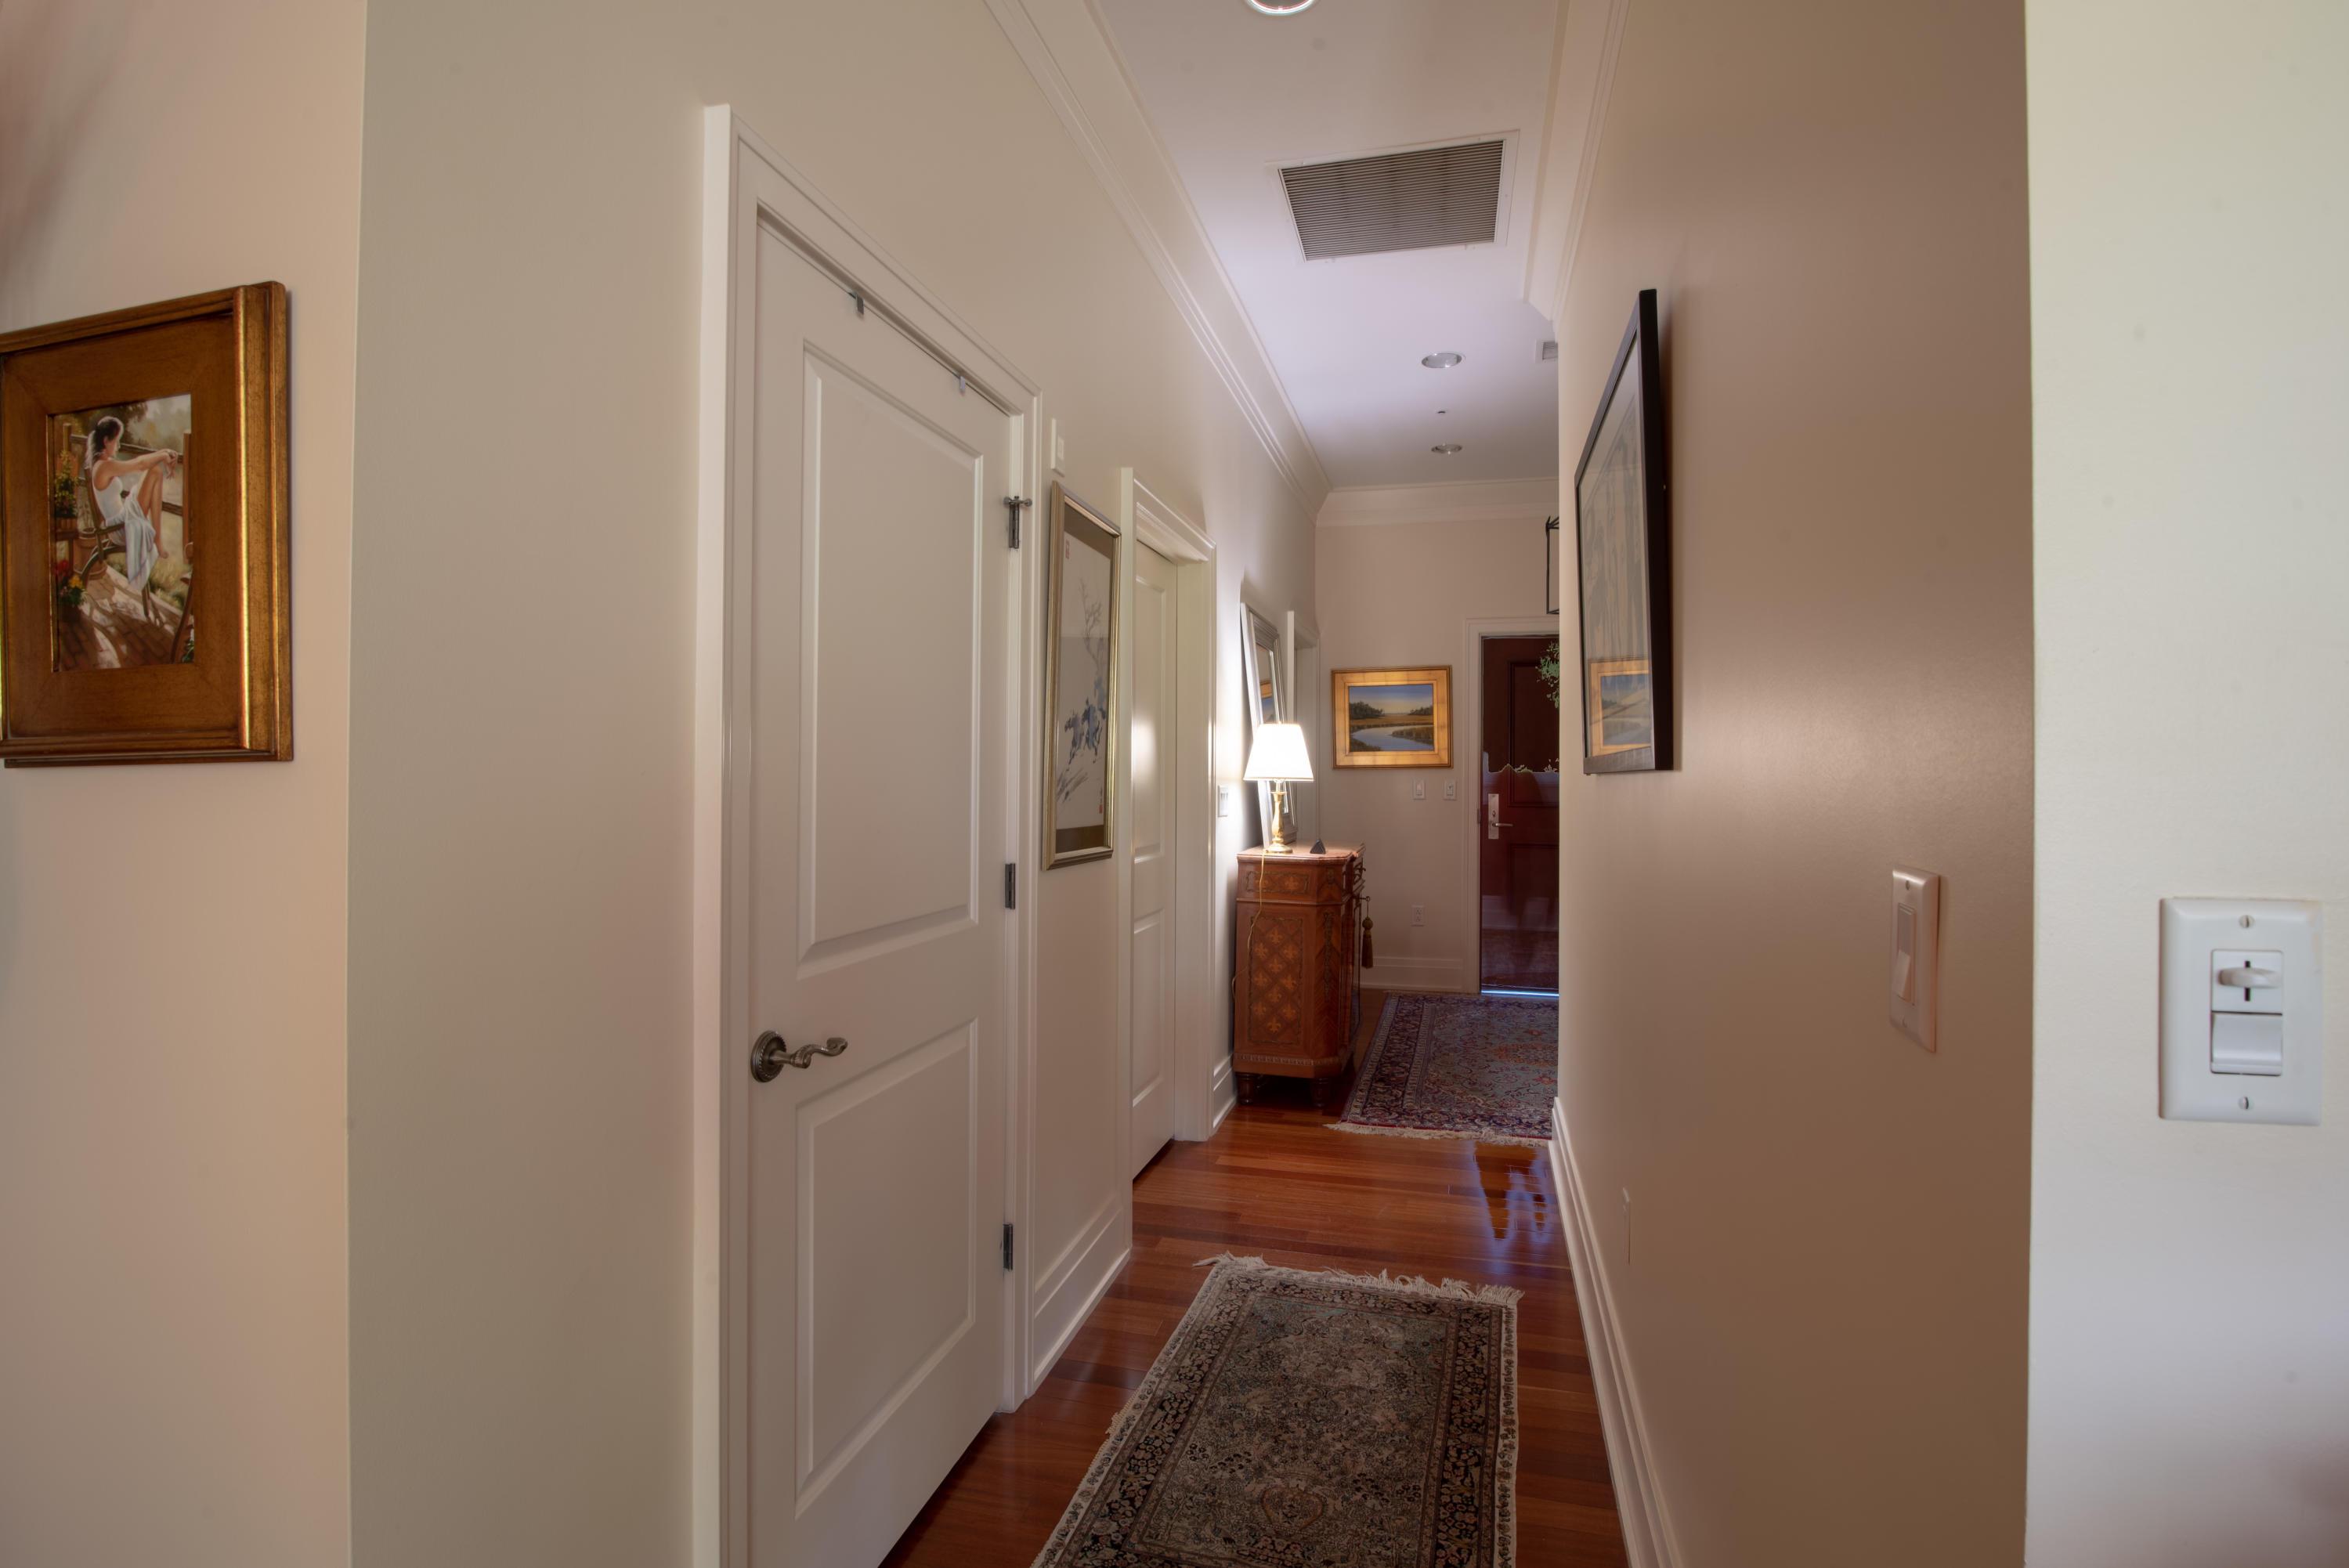 Tides Condominiums Homes For Sale - 212 Cooper River, Mount Pleasant, SC - 11